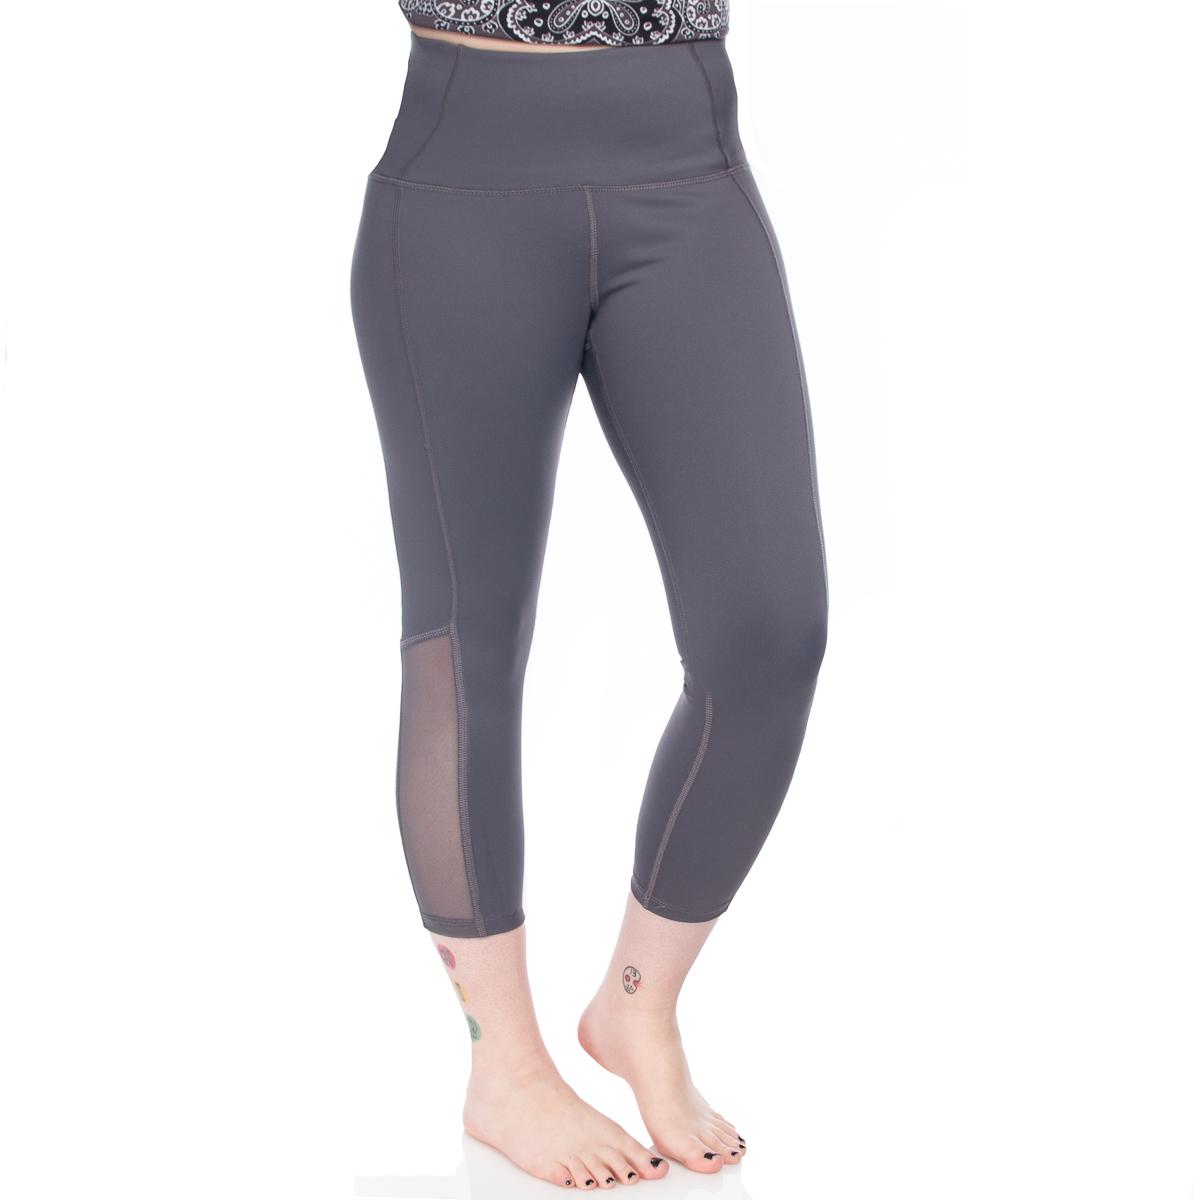 7-8-Length-High-Waist-Moisture-Wicking-UPF-50-Leggings-Run-Gym-Yoga-Pants-Mesh thumbnail 10